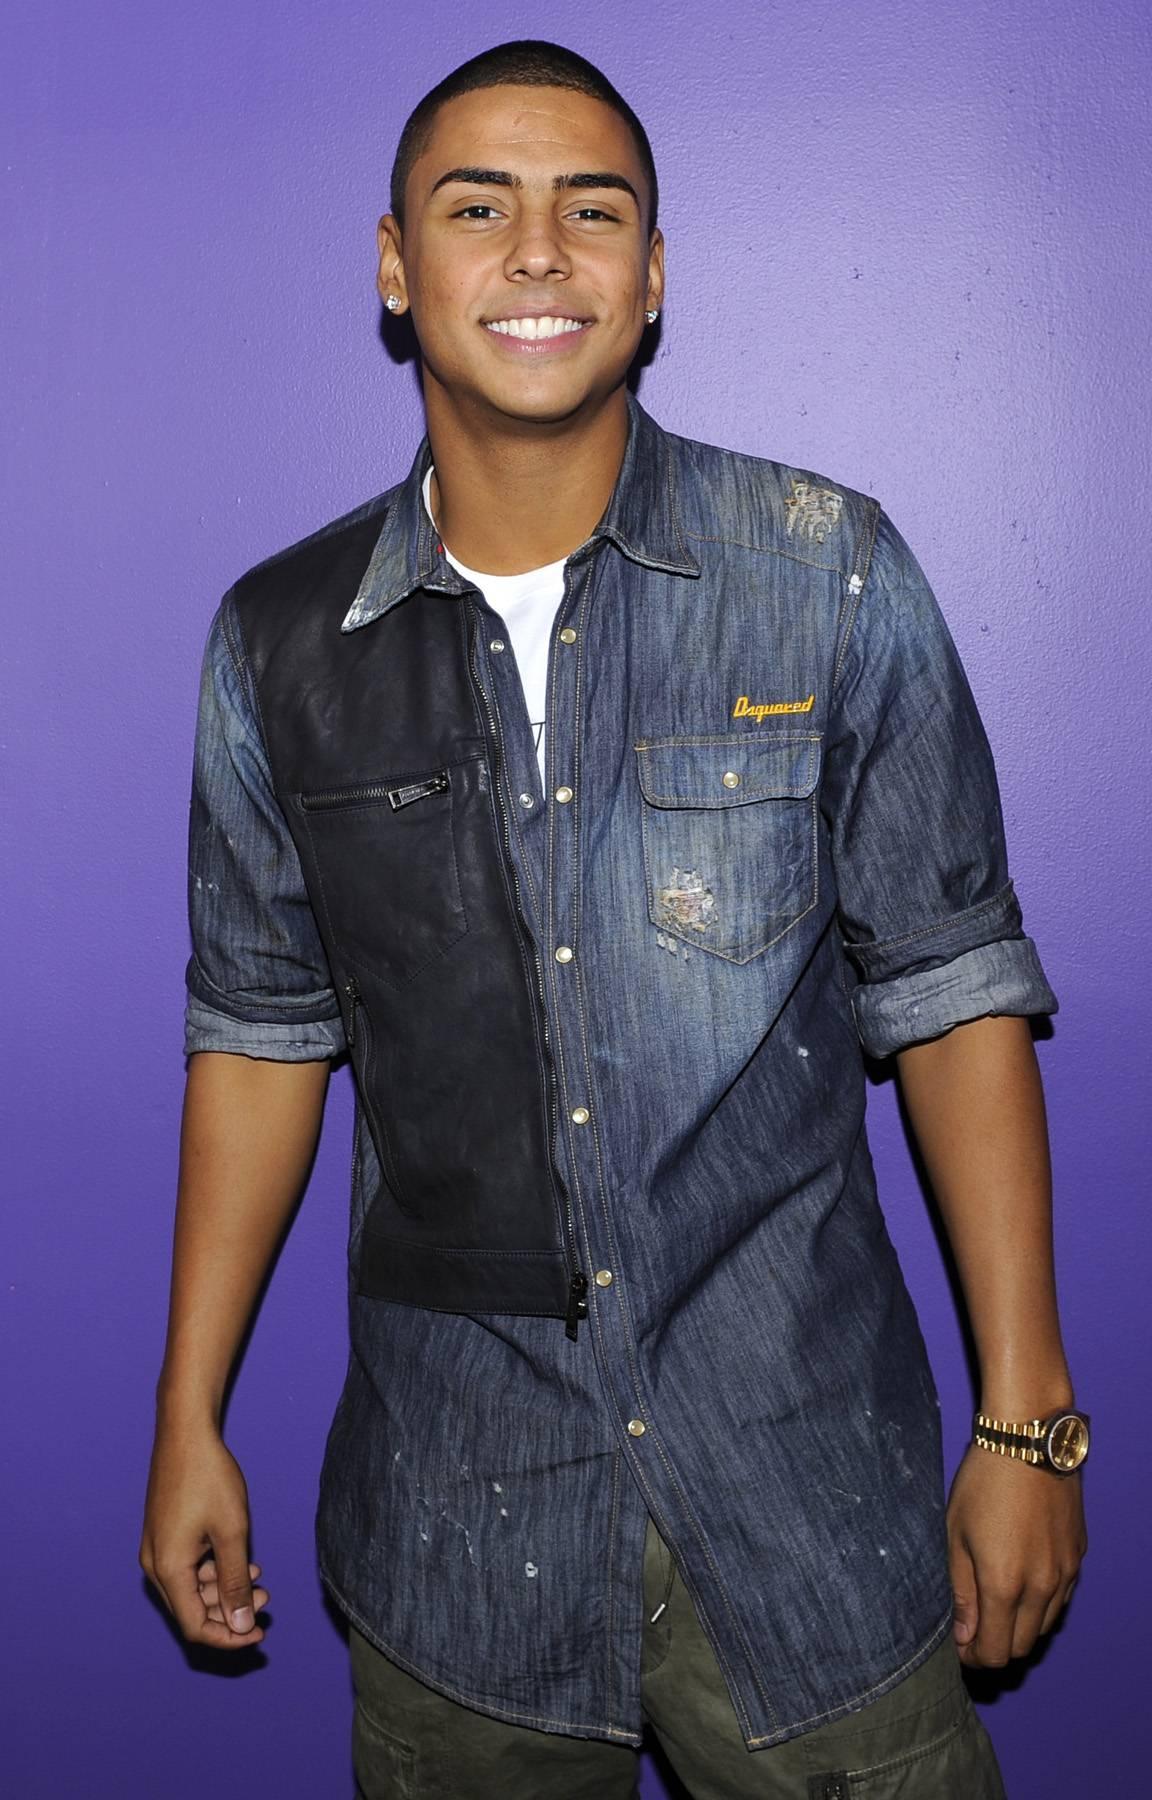 Smooth - Quincy backstage at106 & Park, May 3, 2012. (Photo: John Ricard / BET)